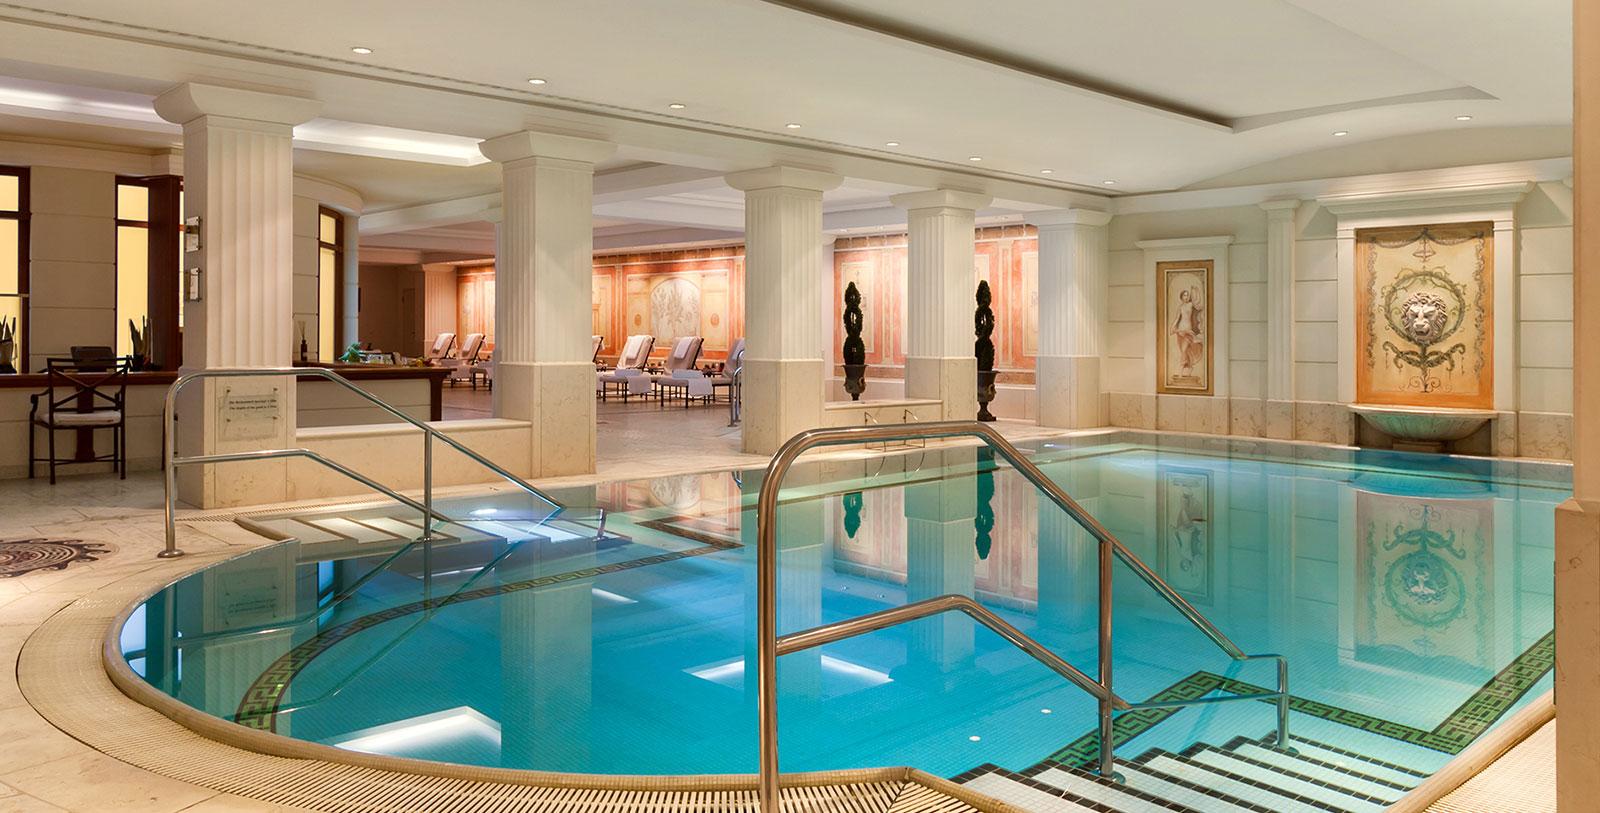 Image of Pool, Hotel Adlon Kempinski, Berlin, Germany, 1907, Member of Historic Hotels Worldwide, Spa